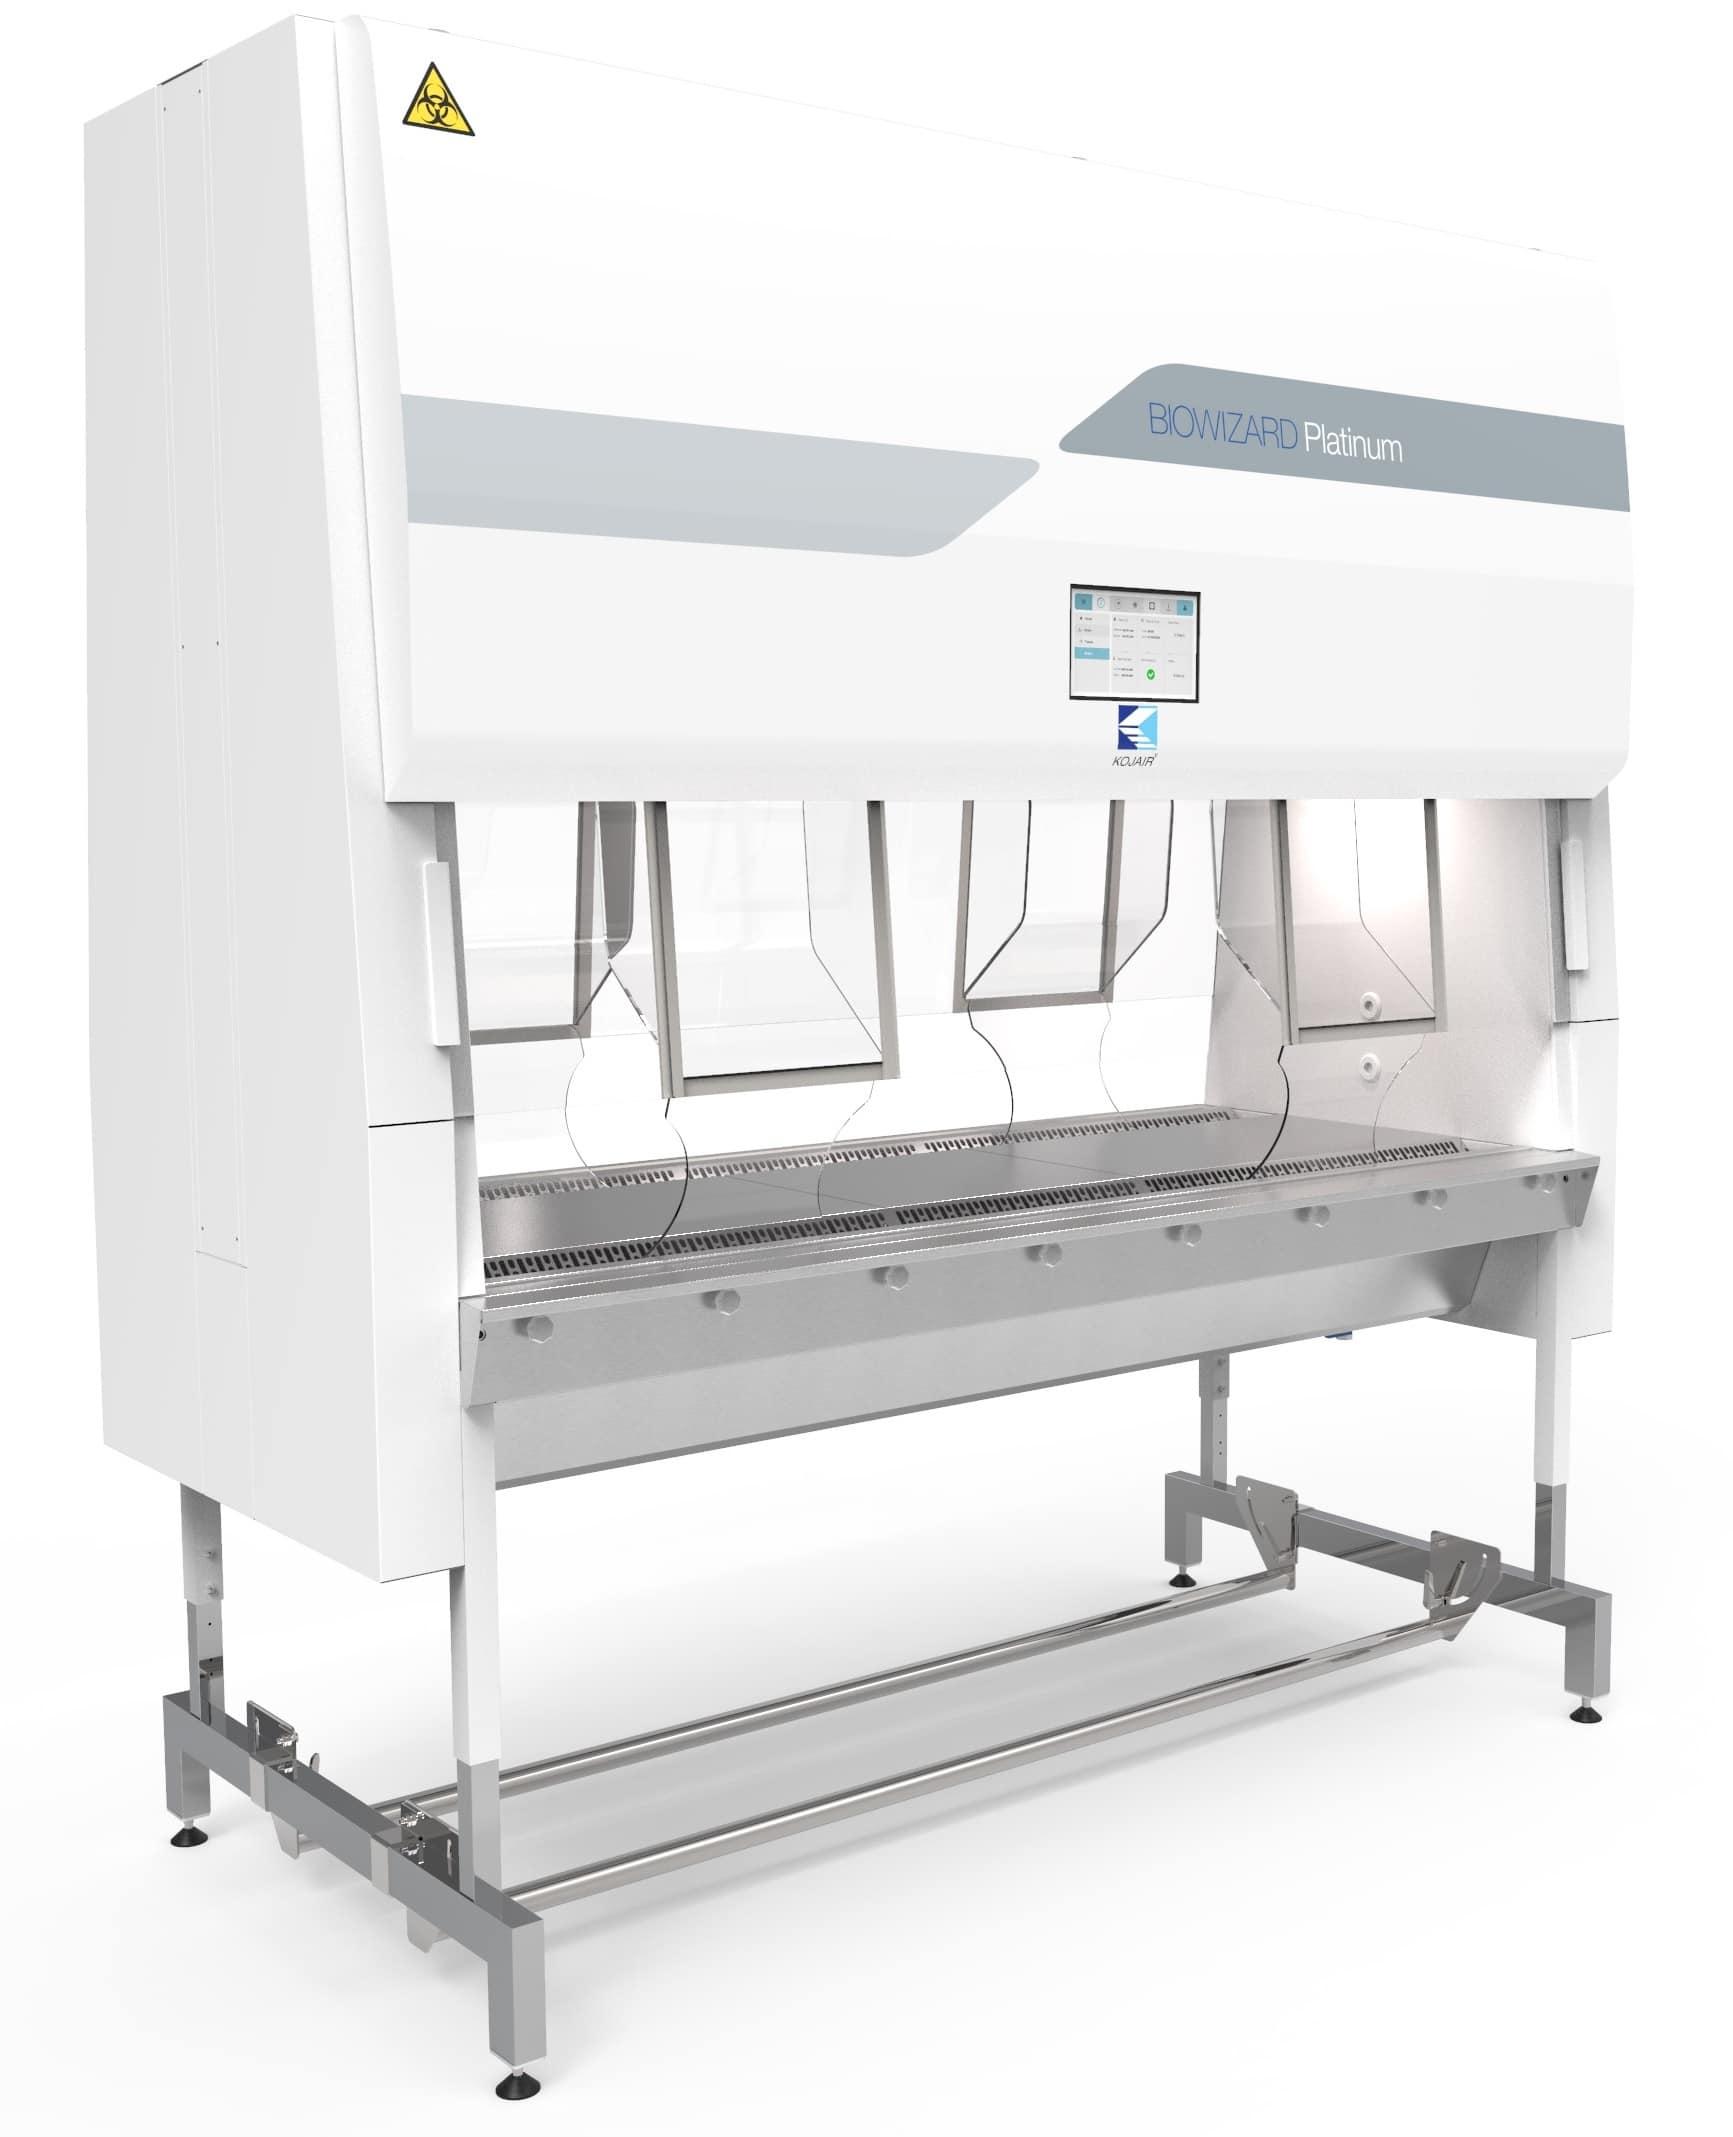 Kojair Platinum Dual tailor made microbiological safety cabinet